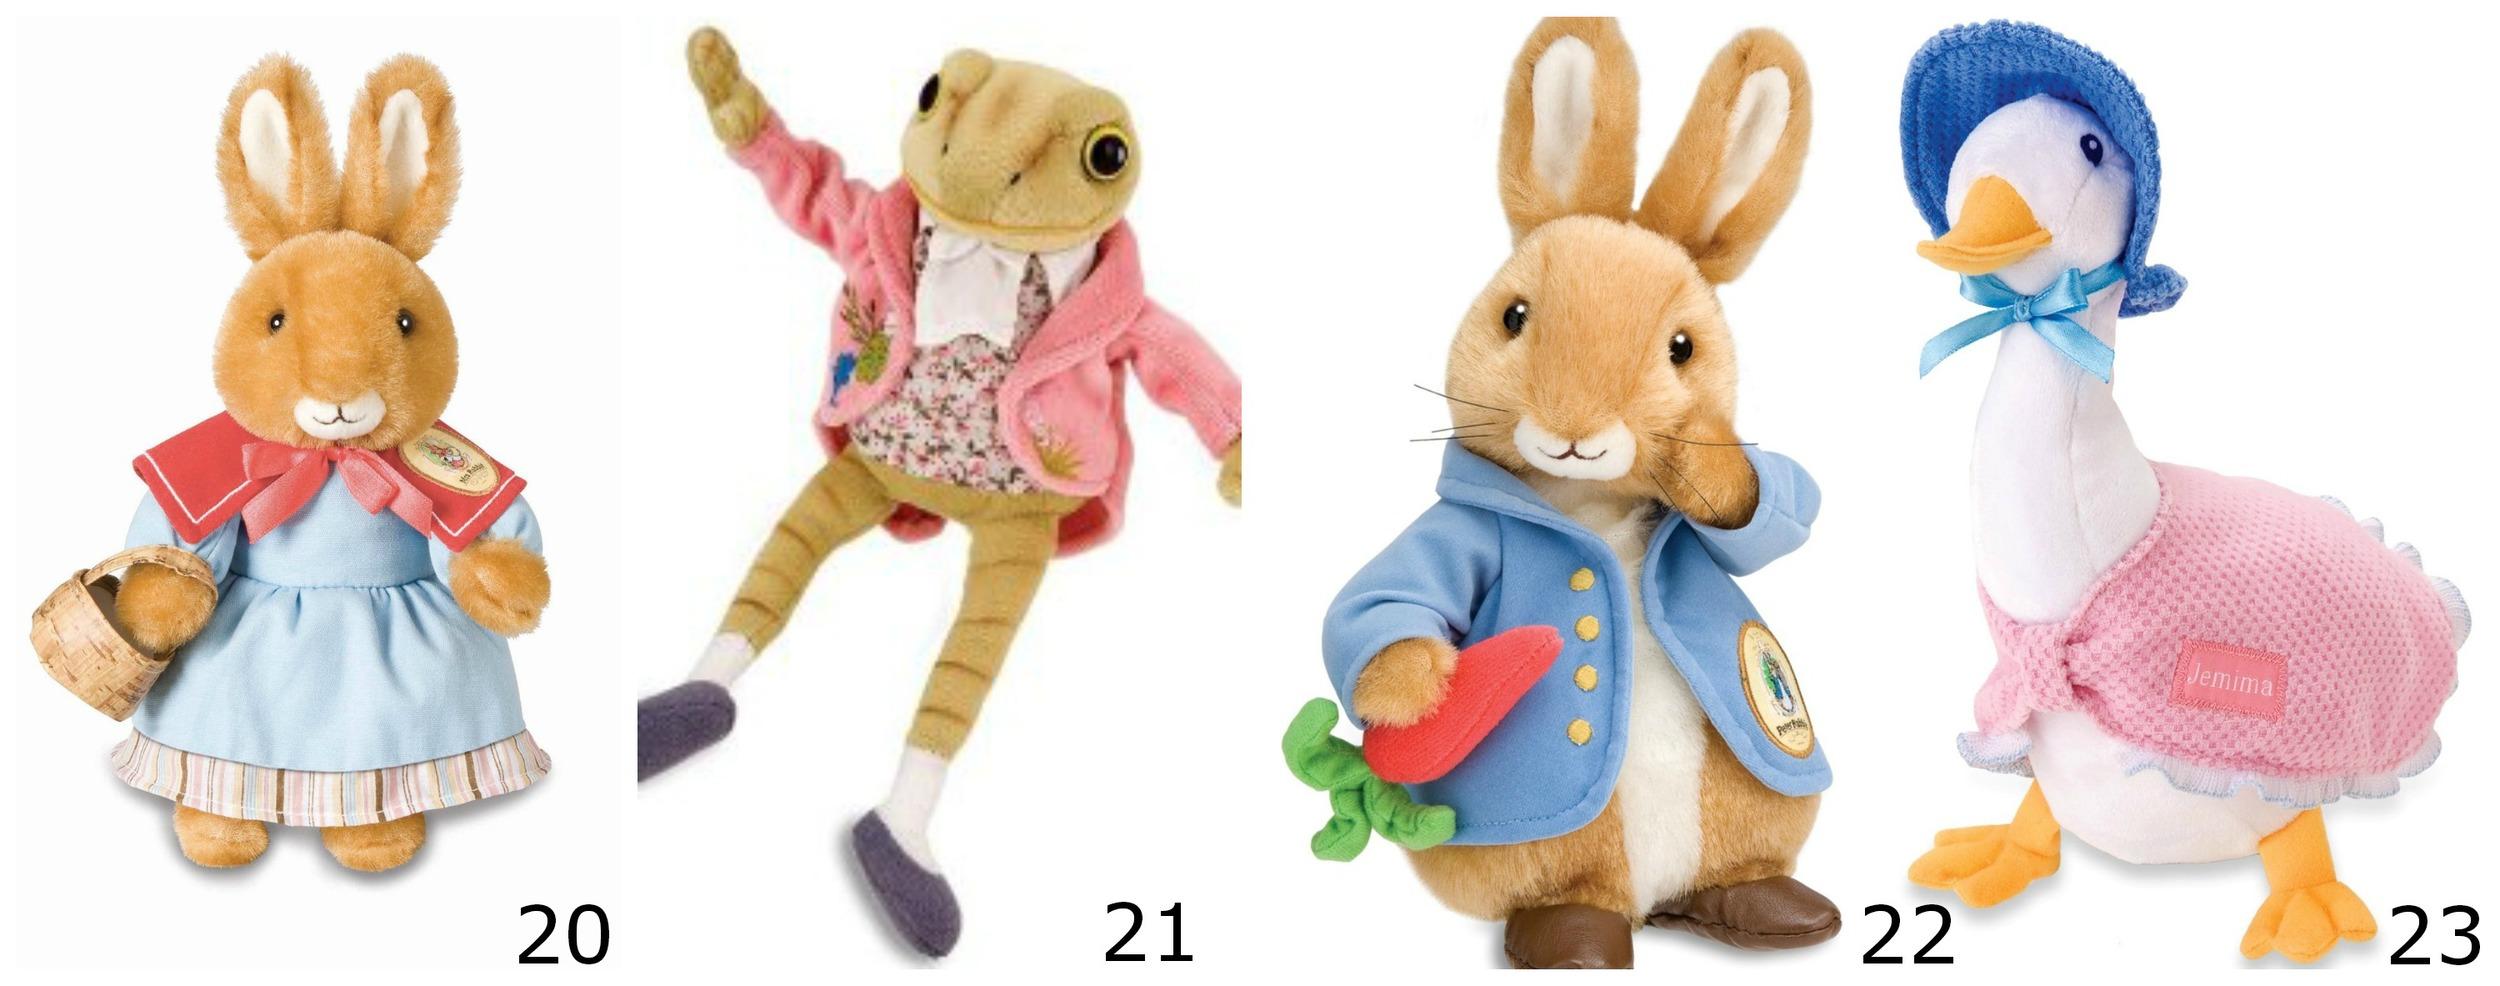 Peter Rabbit Collage.1.jpg